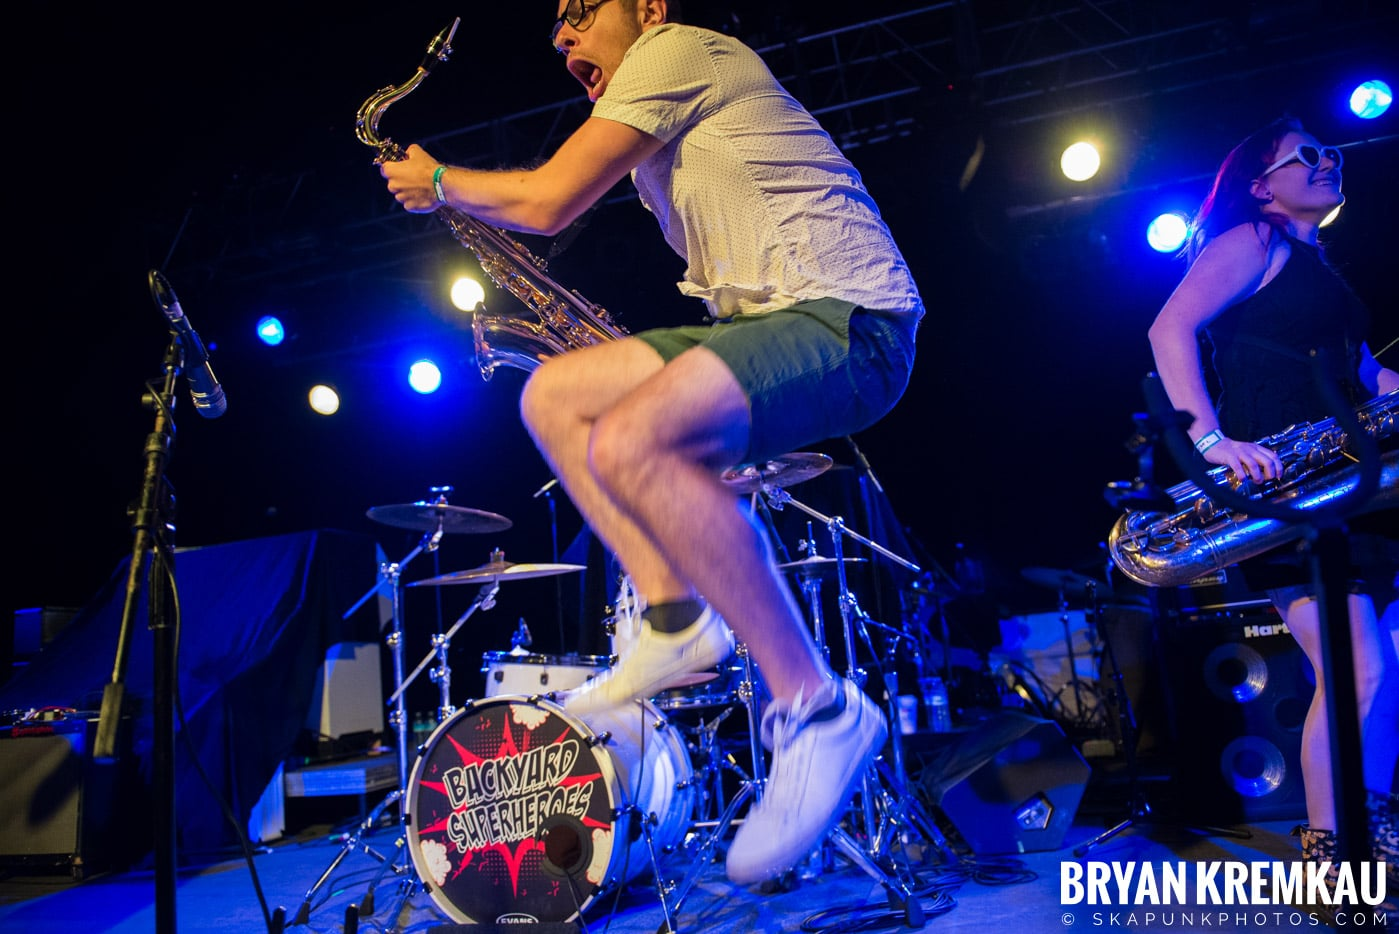 Backyard Superheroes @ Starland Ballroom, Sayreville, NJ - 7.29.17 (26)